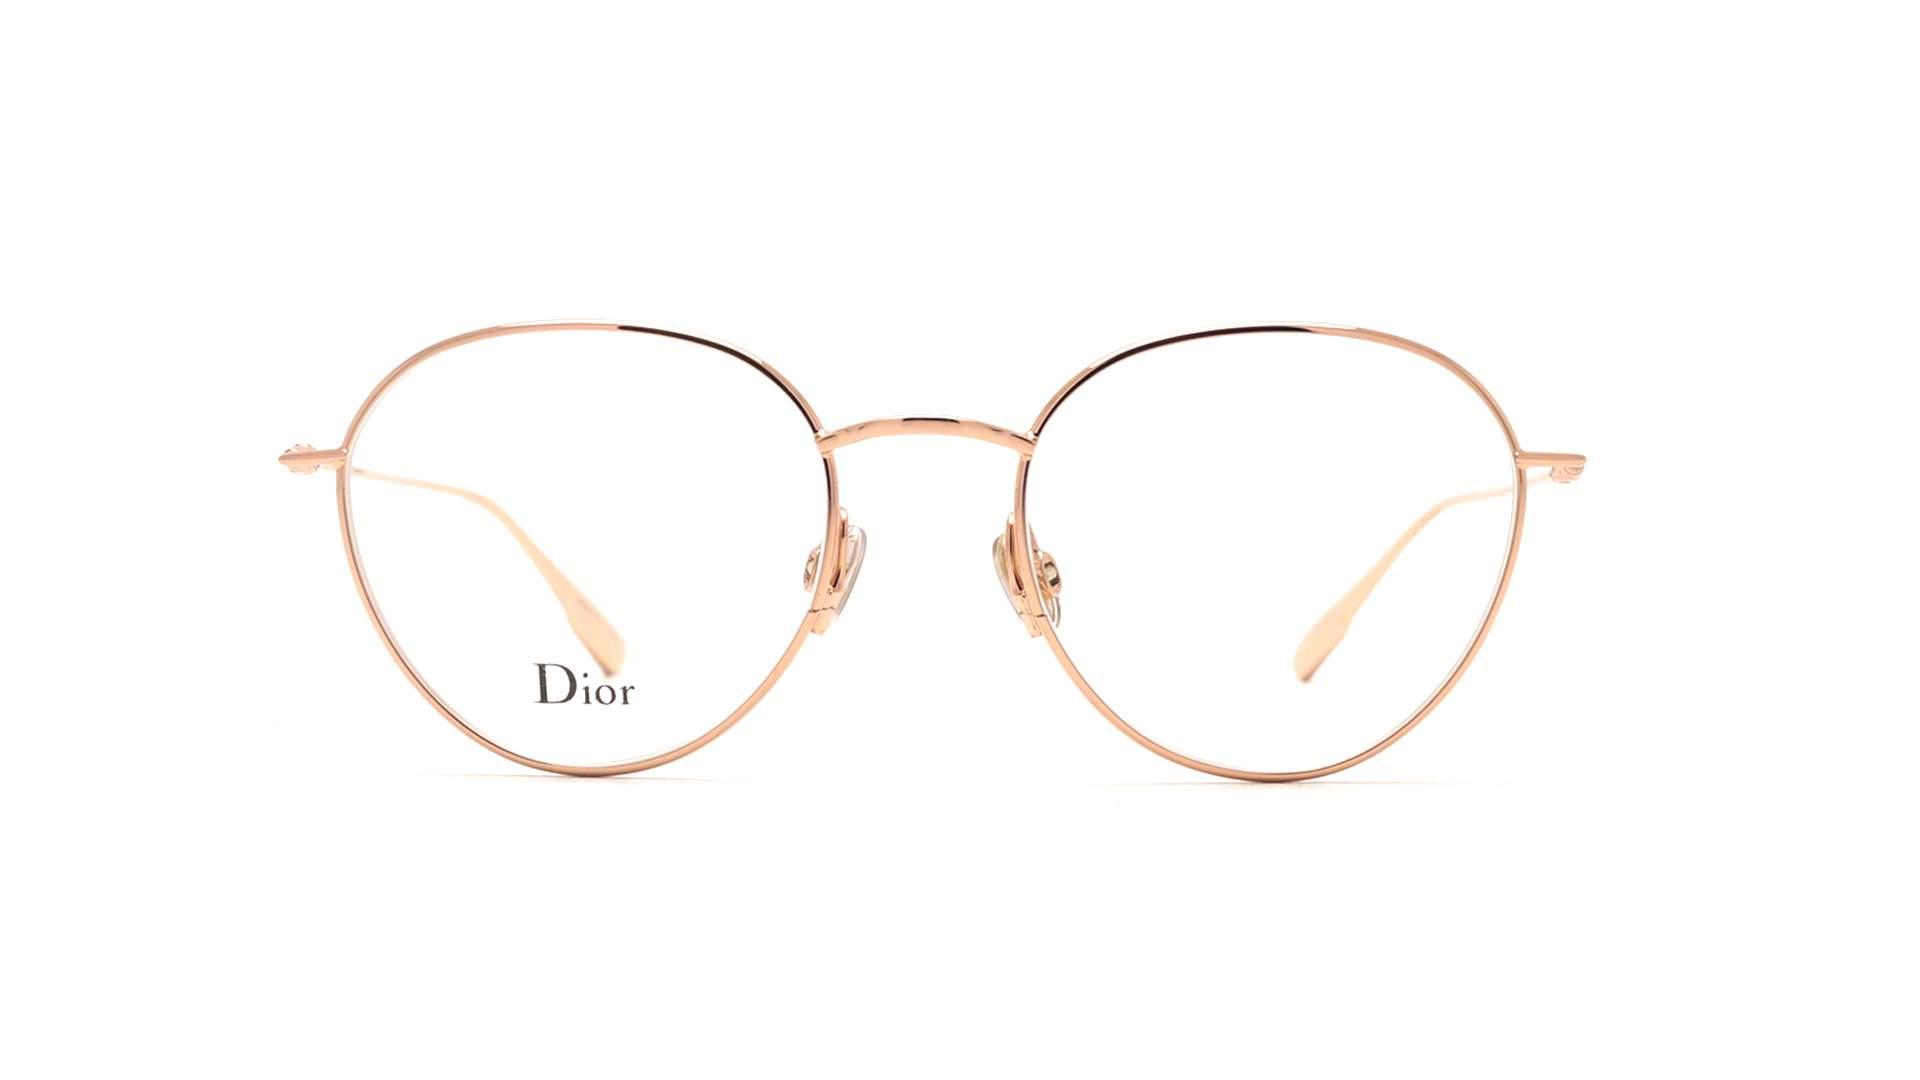 Occhiali da sole: Gucci, Dior, D&G, Cartier, Fendi